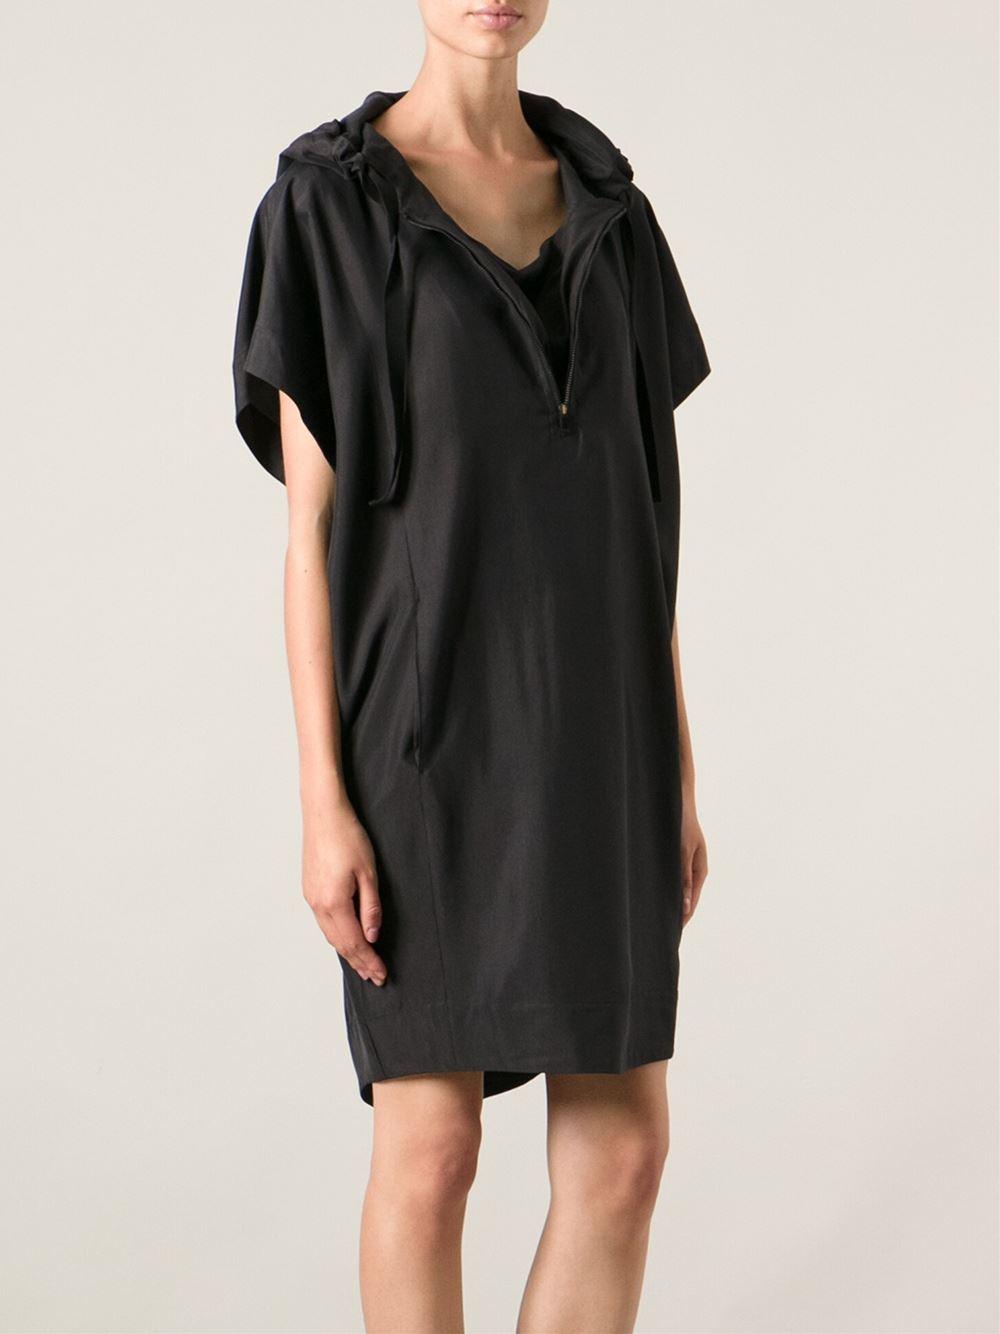 51e1be6b718 MM6 by Maison Martin Margiela Hooded Tunic Dress in Black - Lyst